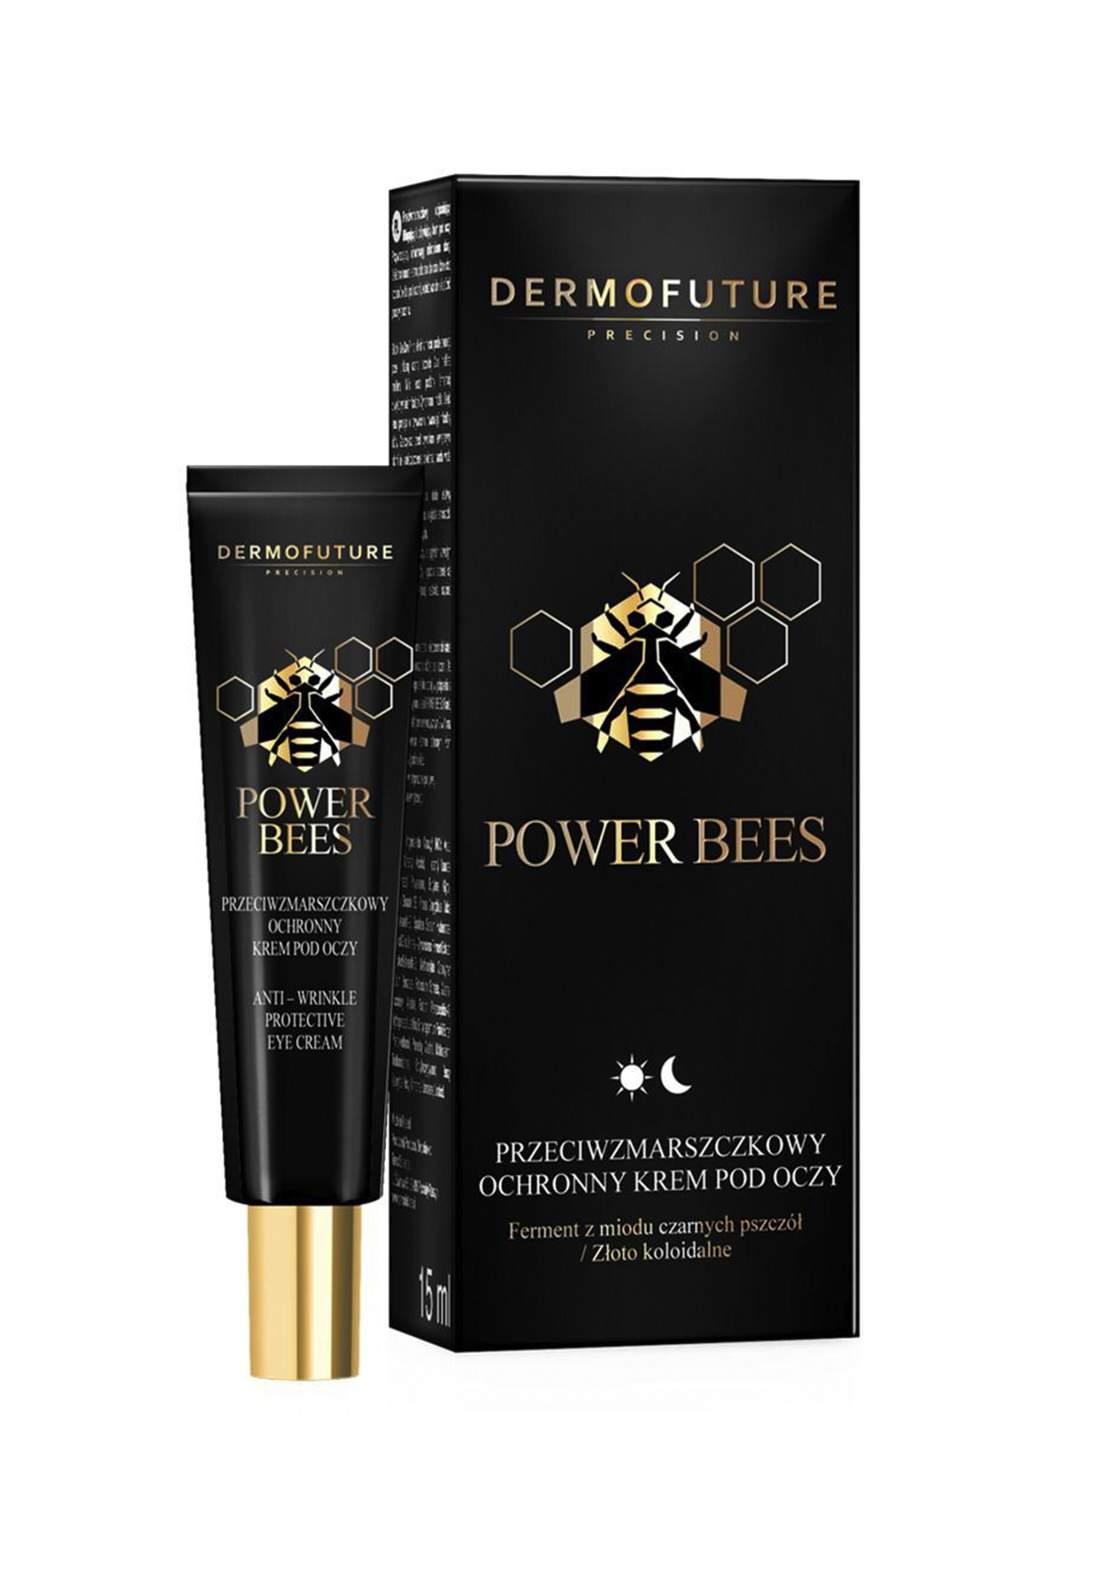 Dermofuture Precision Power Bees Anti-Wrinkle Protective Eye Cream كريم العناية بالعين